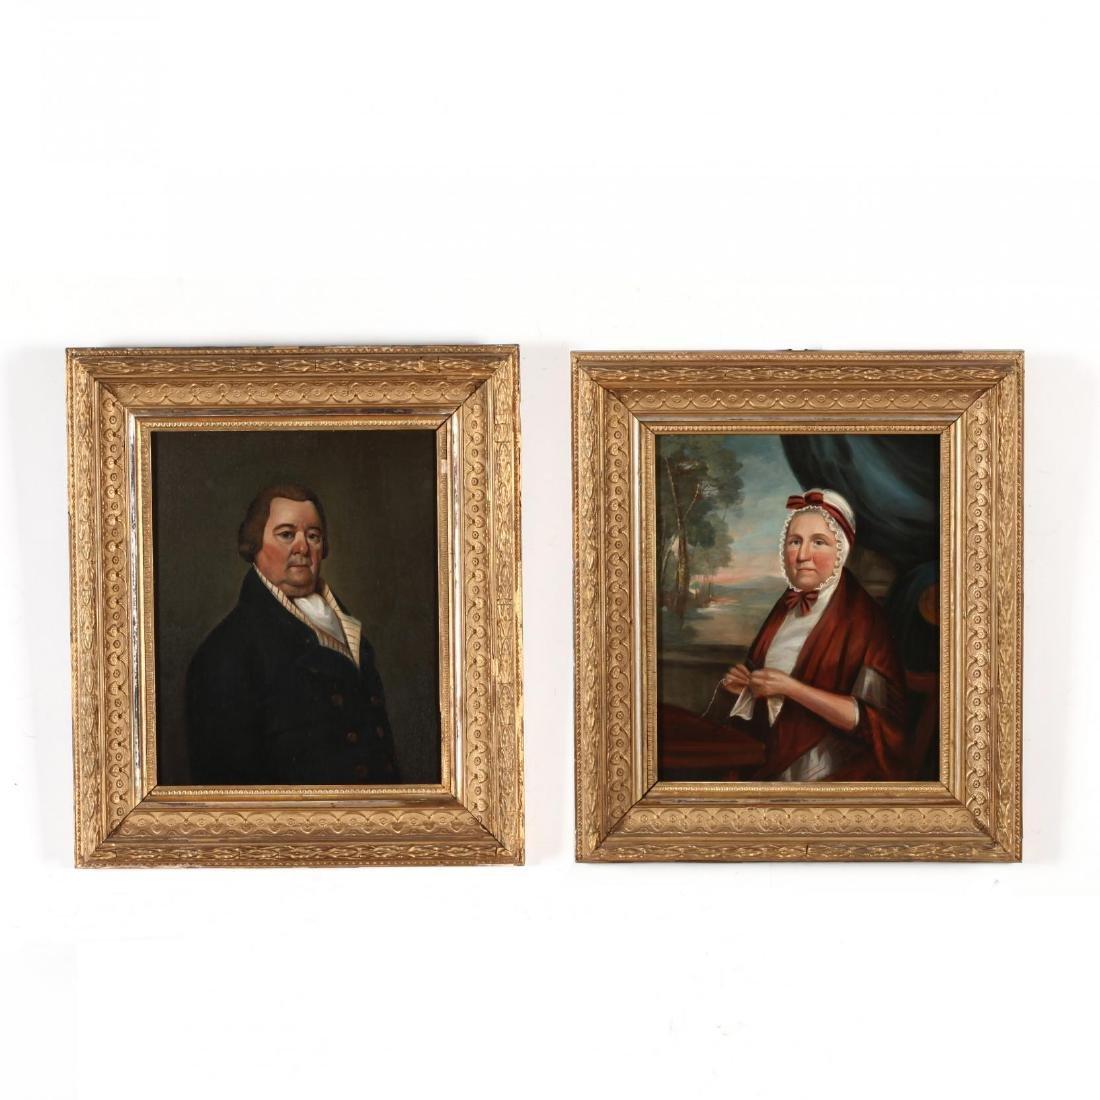 A Pair of Provincial School Portrait Paintings